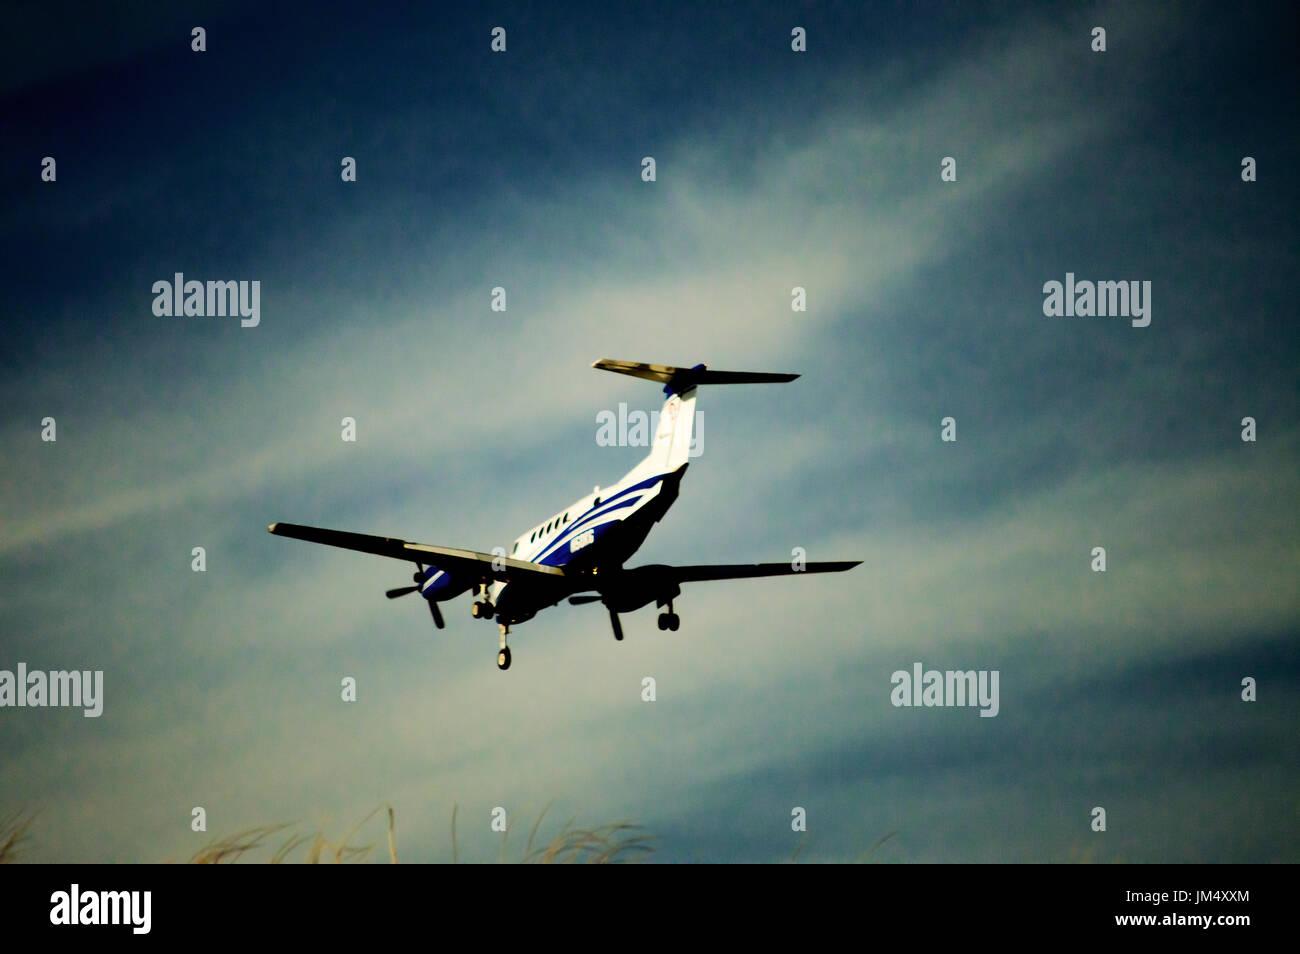 A small prop passenger plane landing. Stock Photo